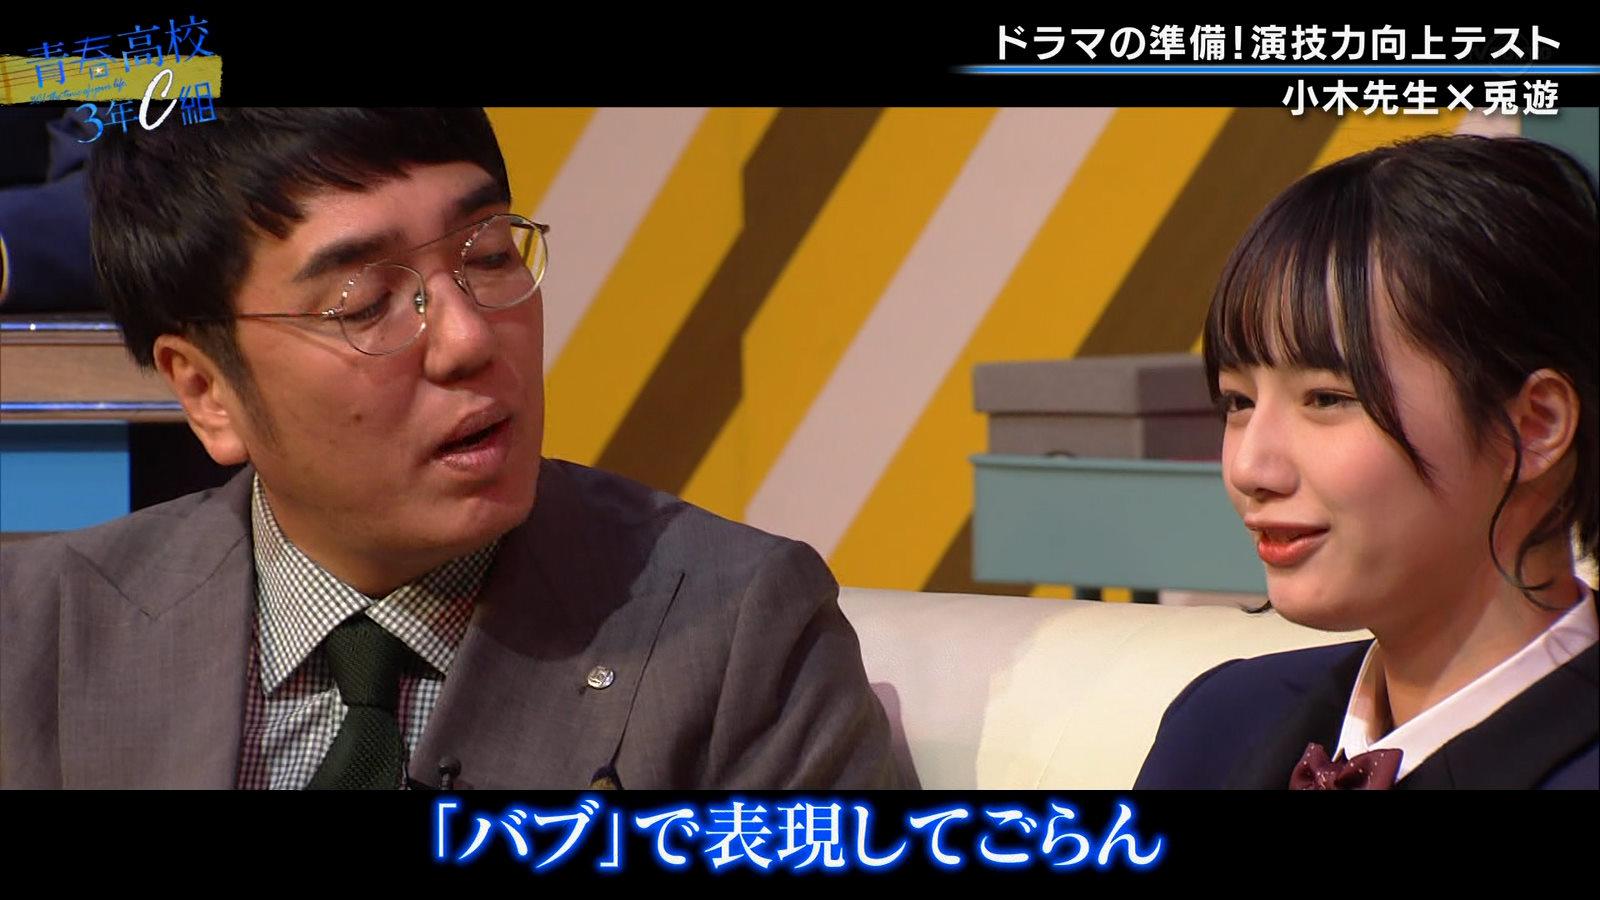 https://livedoor.blogimg.jp/vipsister23/imgs/a/c/acb2d1e7.jpg